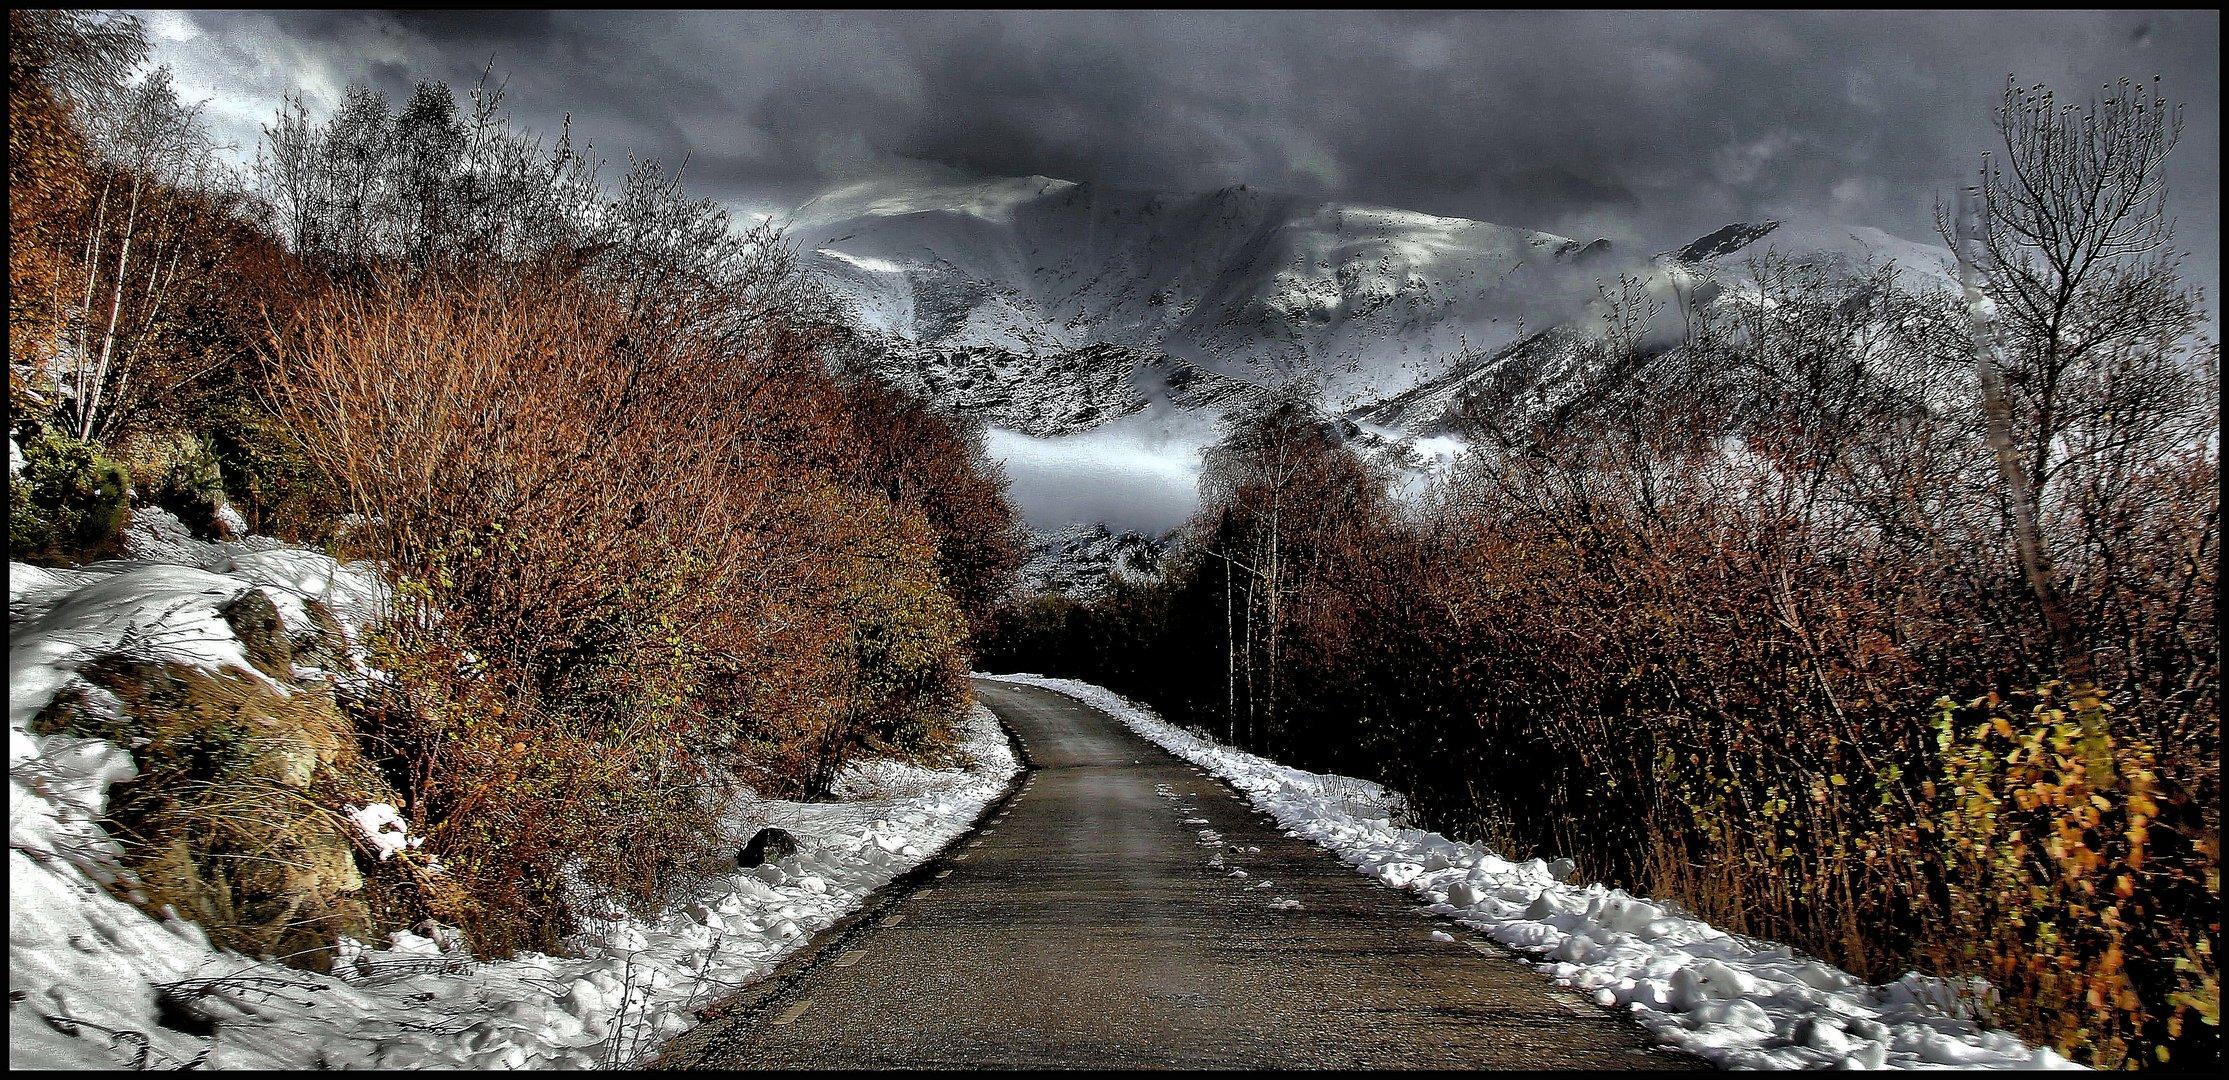 Carretera otoñal